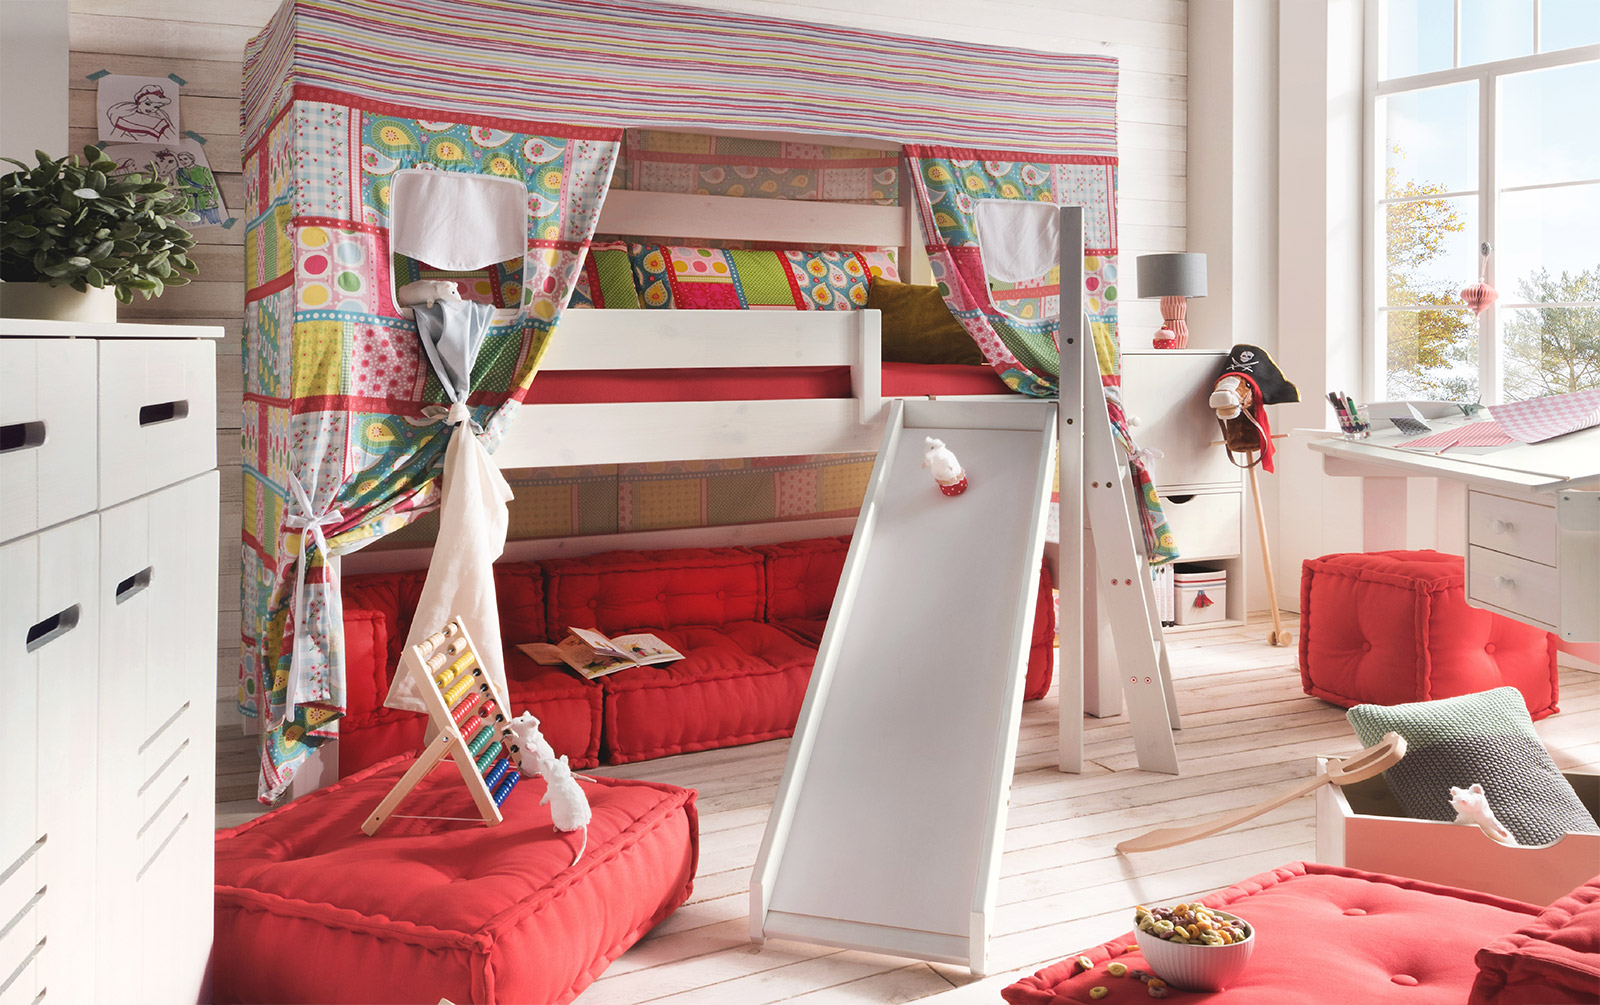 Full Size of Bett Mit Rutsche Himmelbett Hochbett Kiefer Baldachin Kids Dreams Massivholz 180x200 120x200 Günstiges Sofa Bettkasten Holzfüßen Japanische Betten Eiche Bett Bett Mit Rutsche